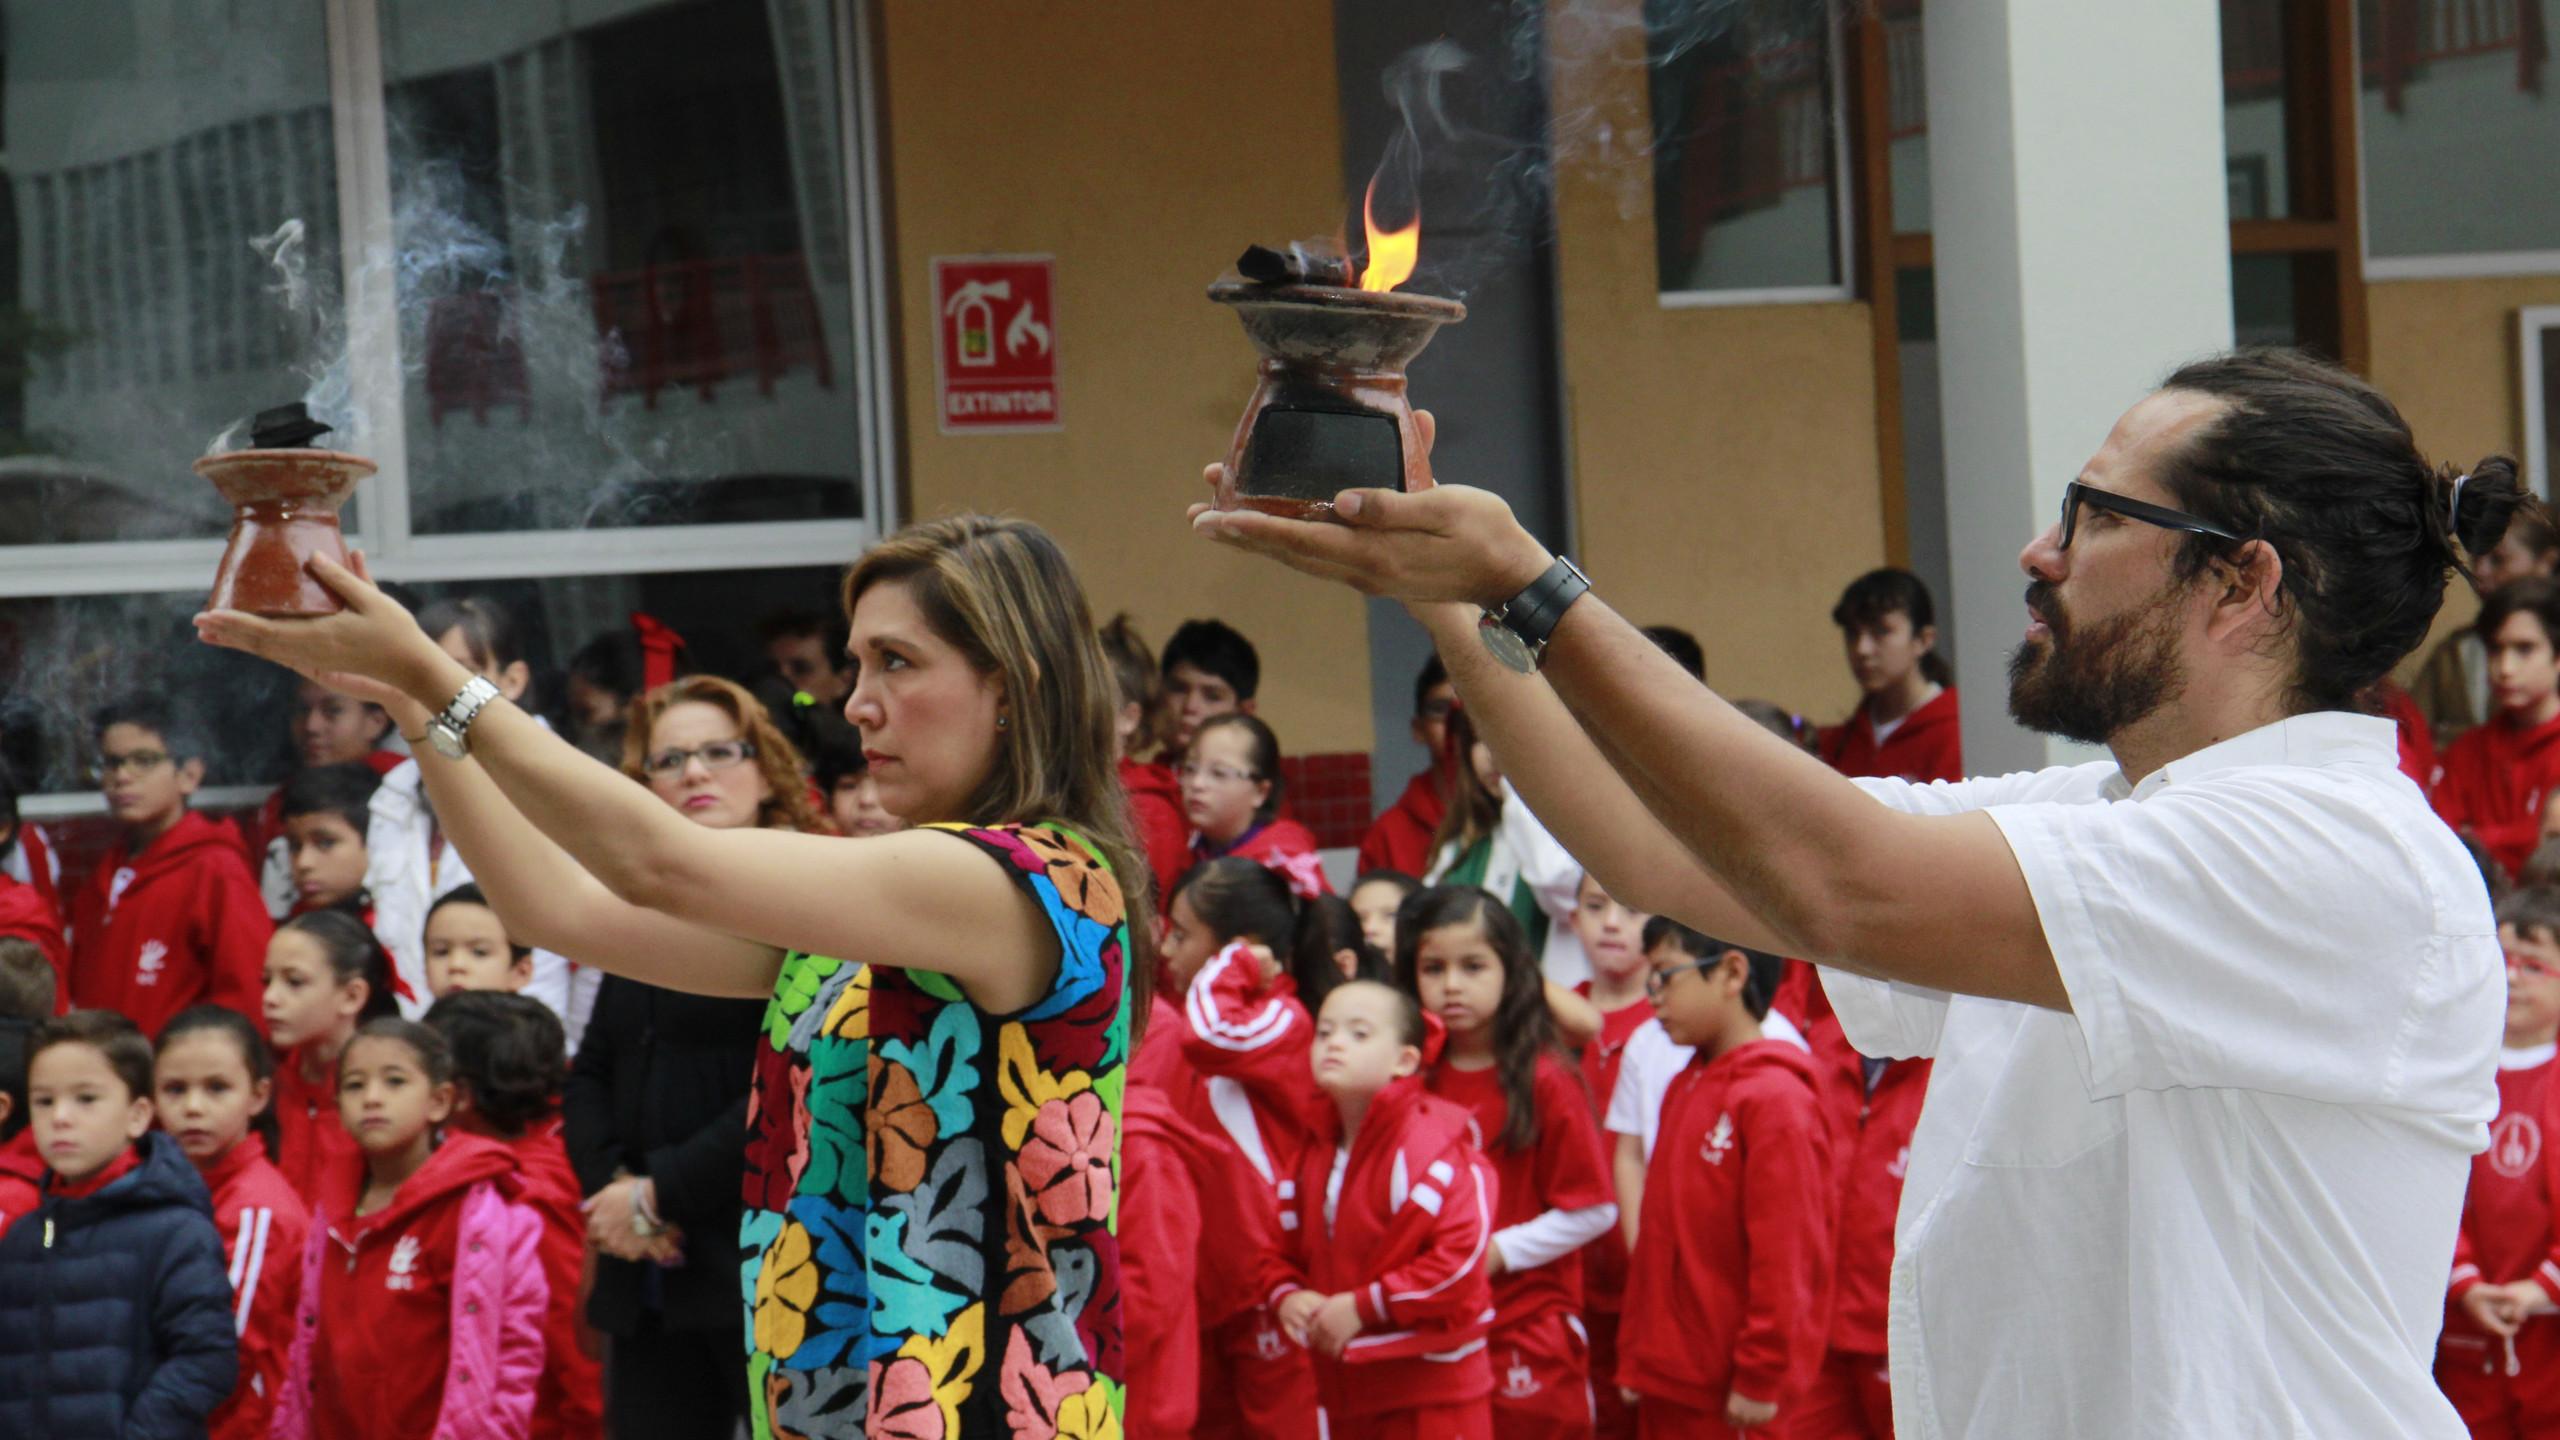 ceremonia tseltal